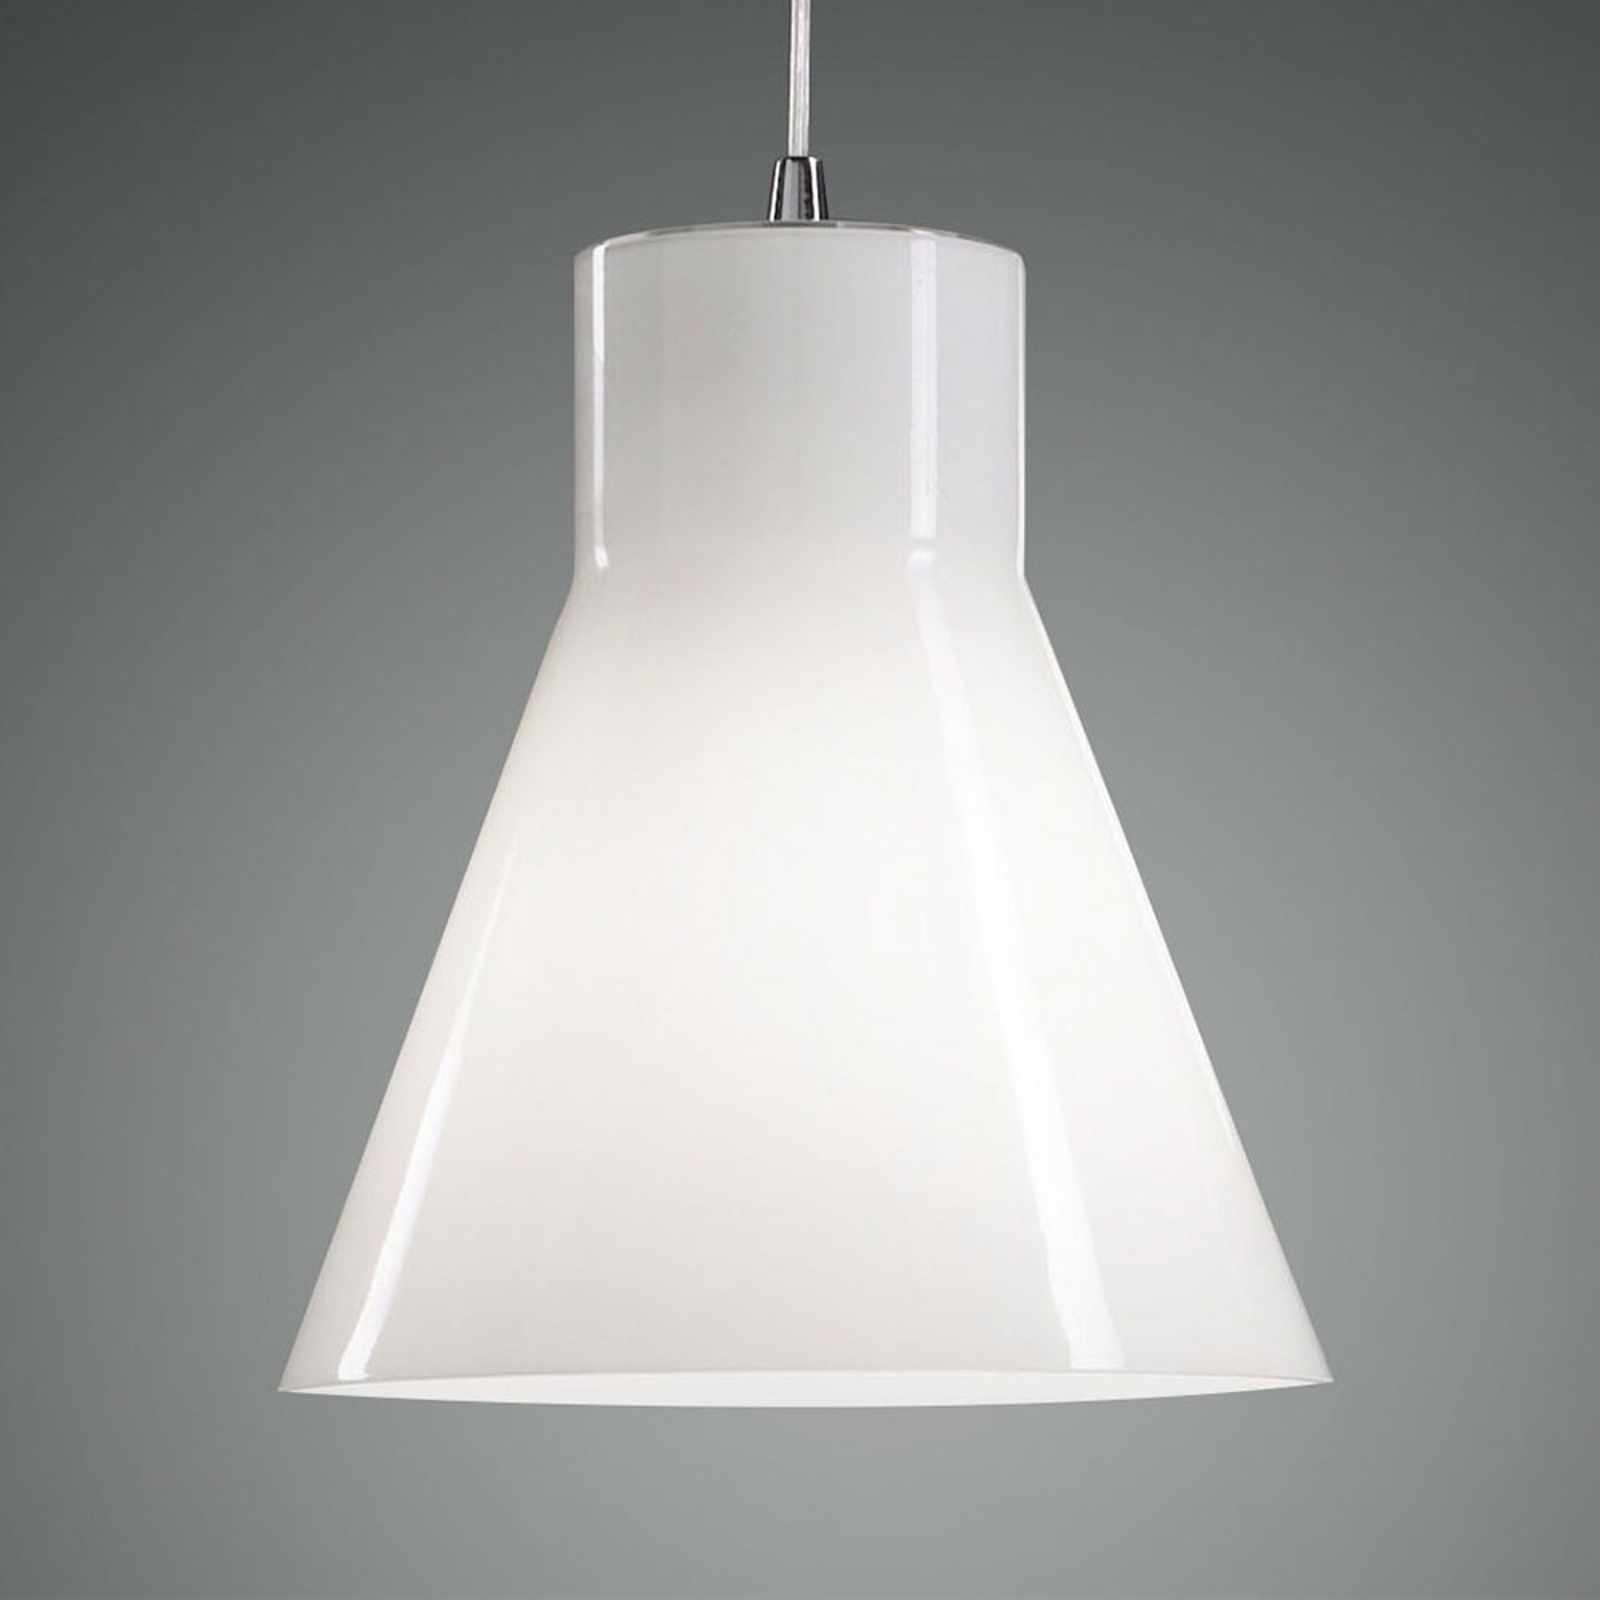 Závesná lampa DANA suspension_3501227_1